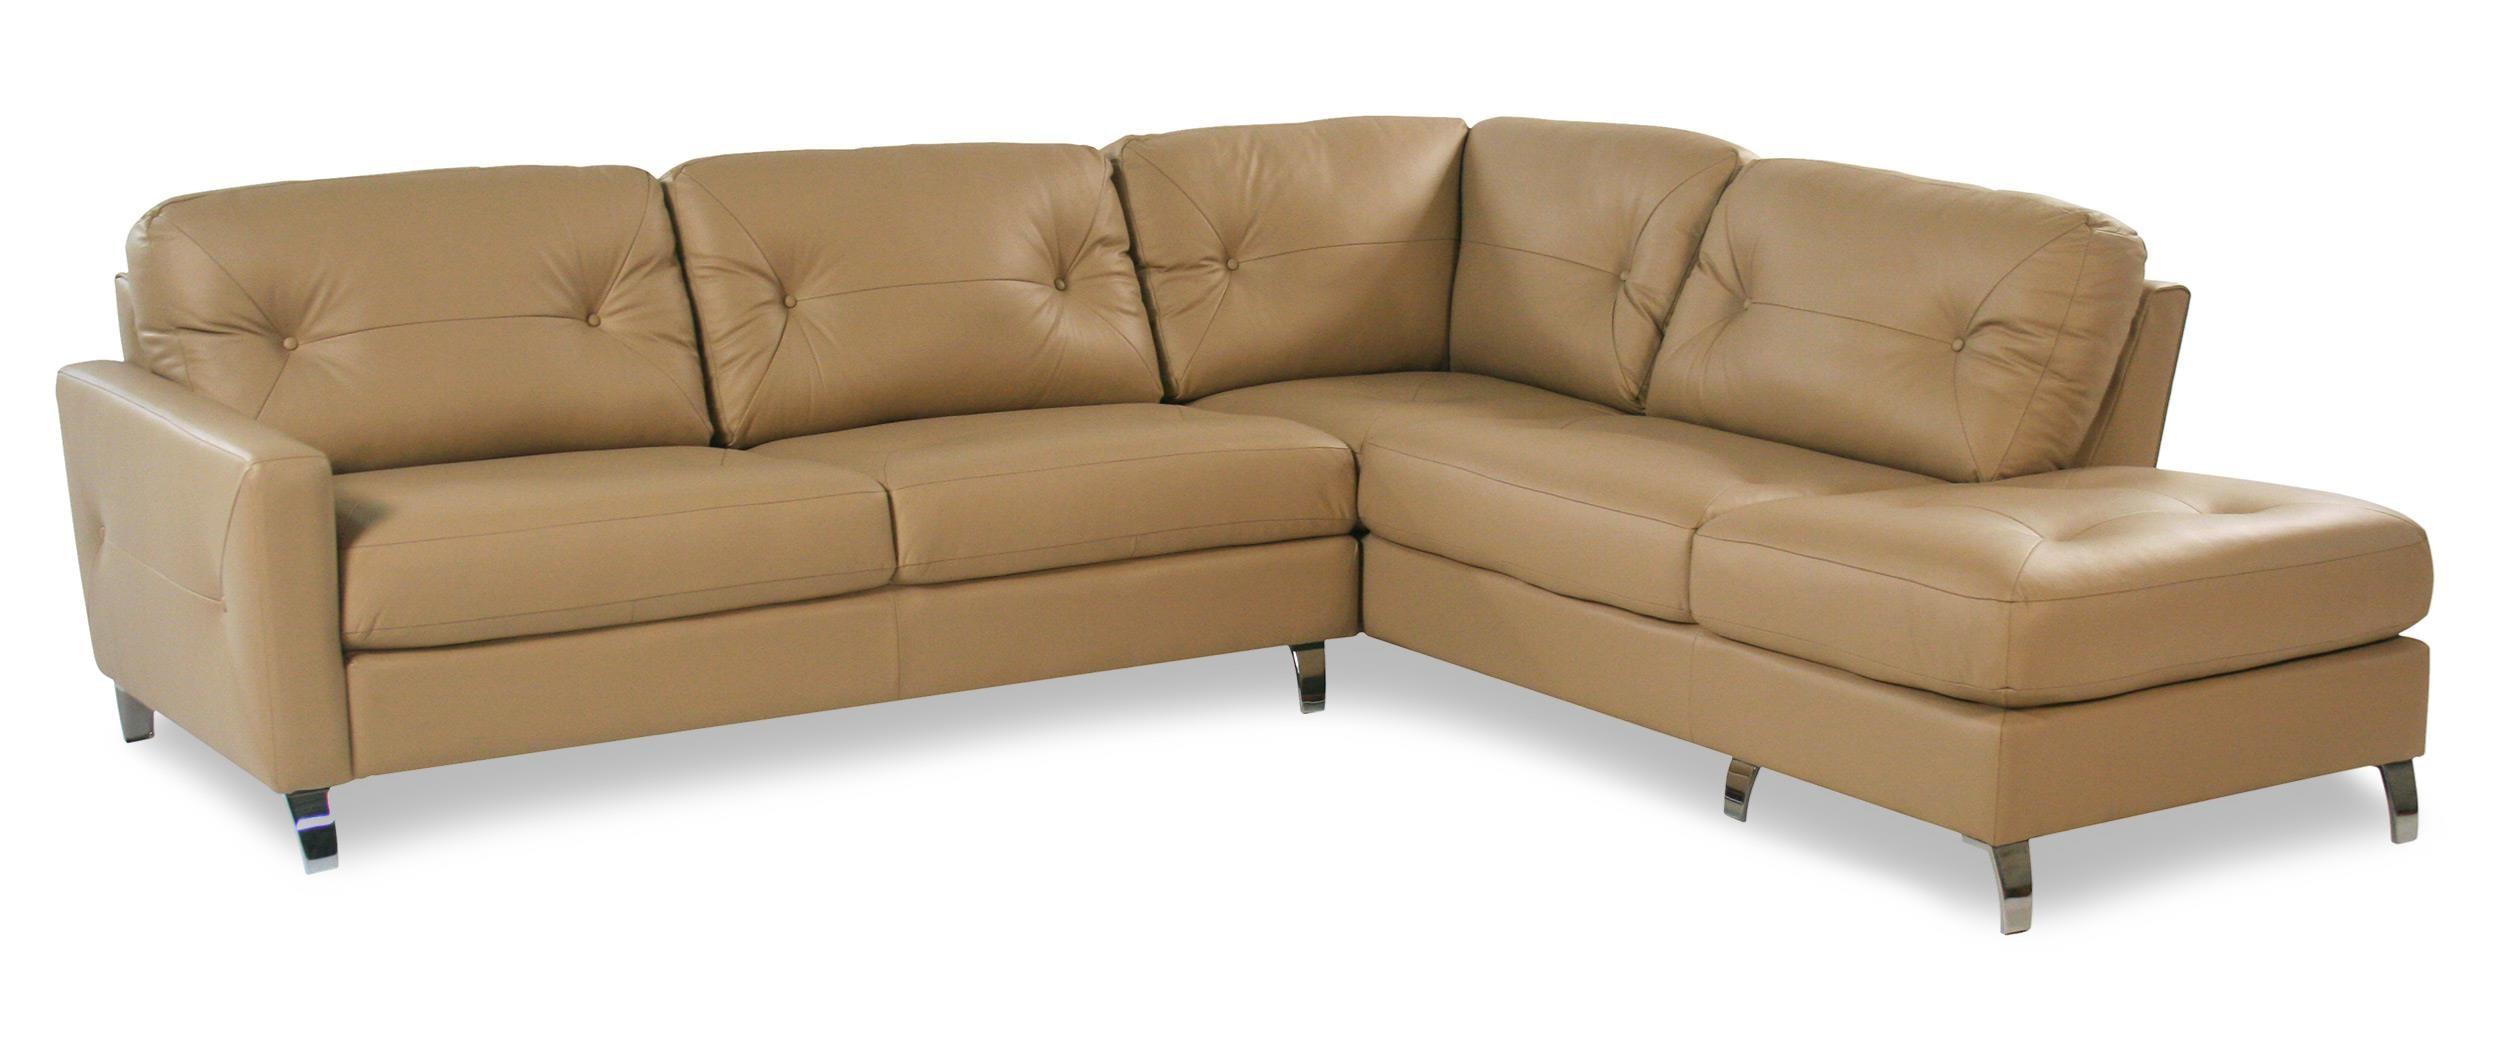 Palliser Berkley 2PC Contemporary Leather Sectional - Item Number: 77781-12+35